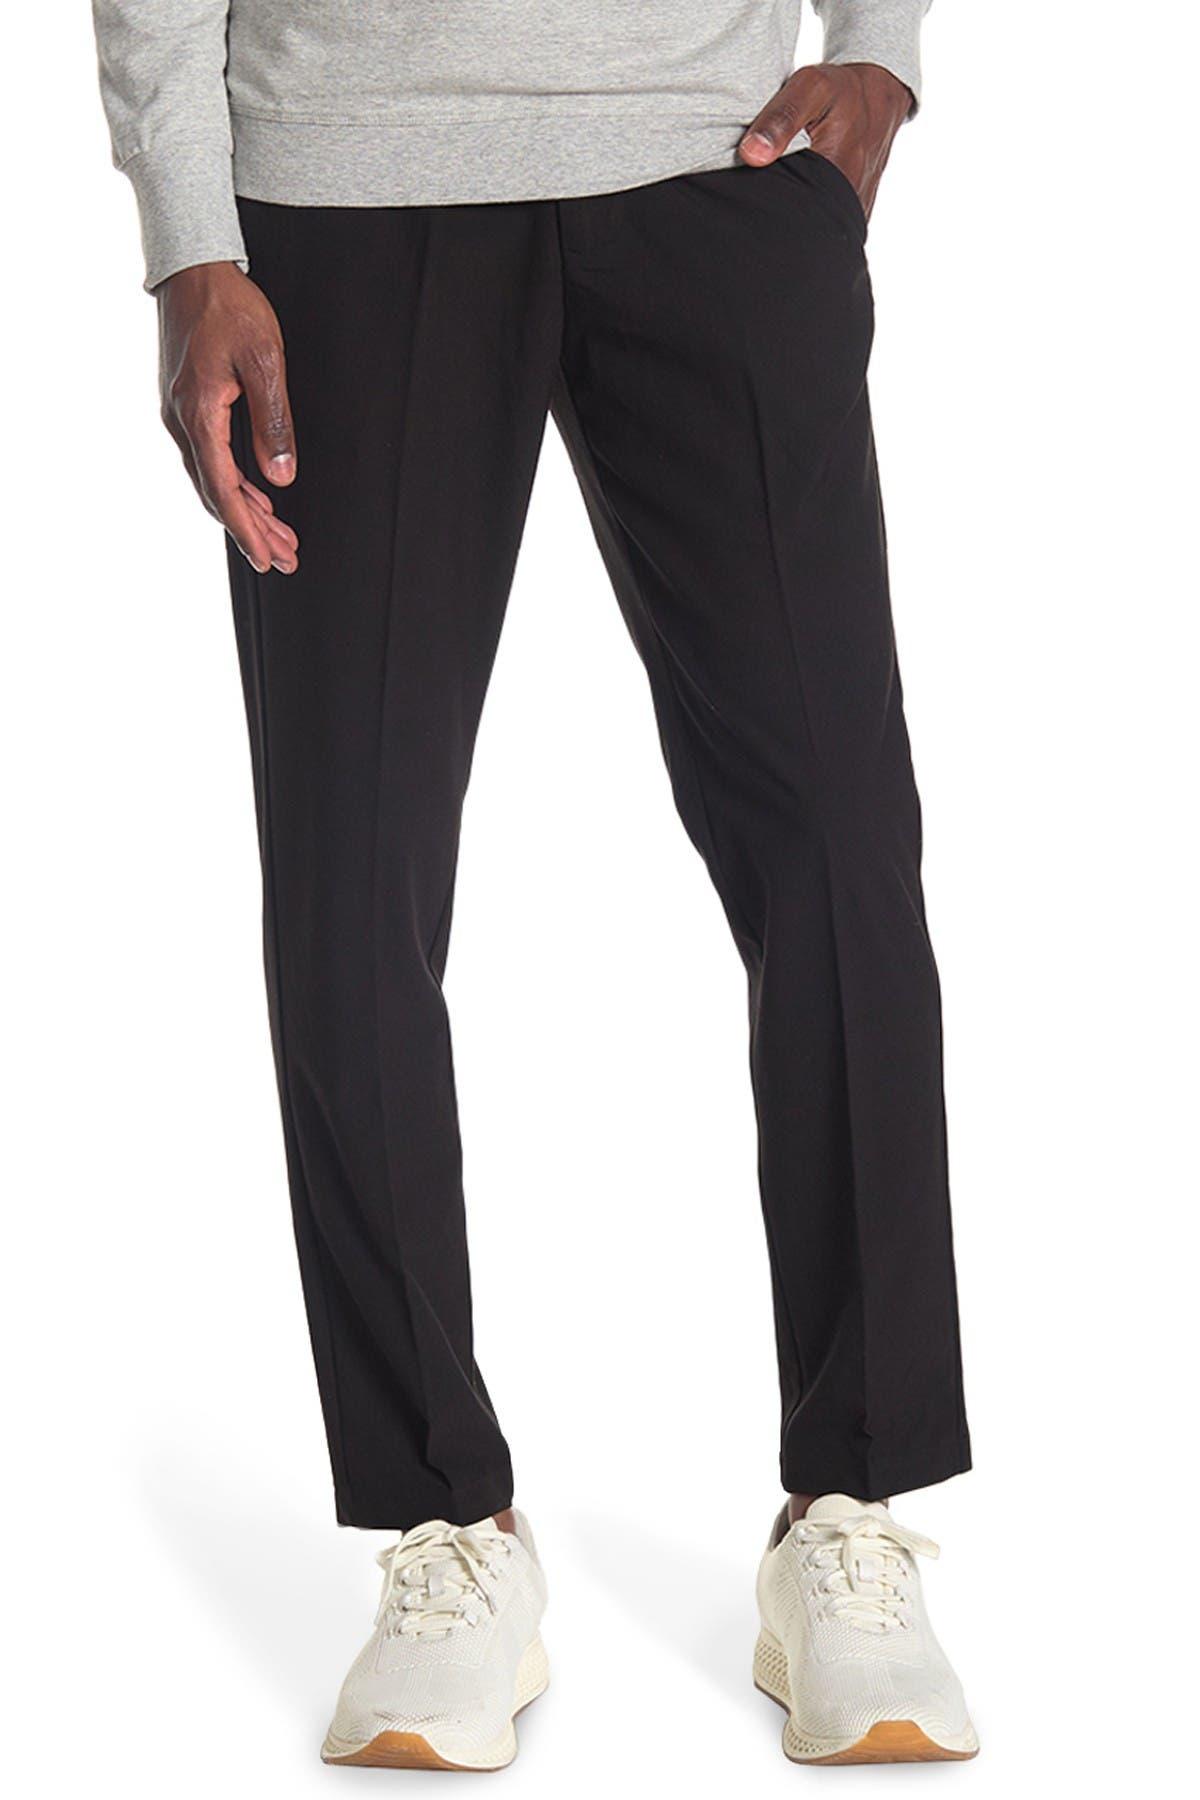 Image of English Laundry Drawstring Trousers